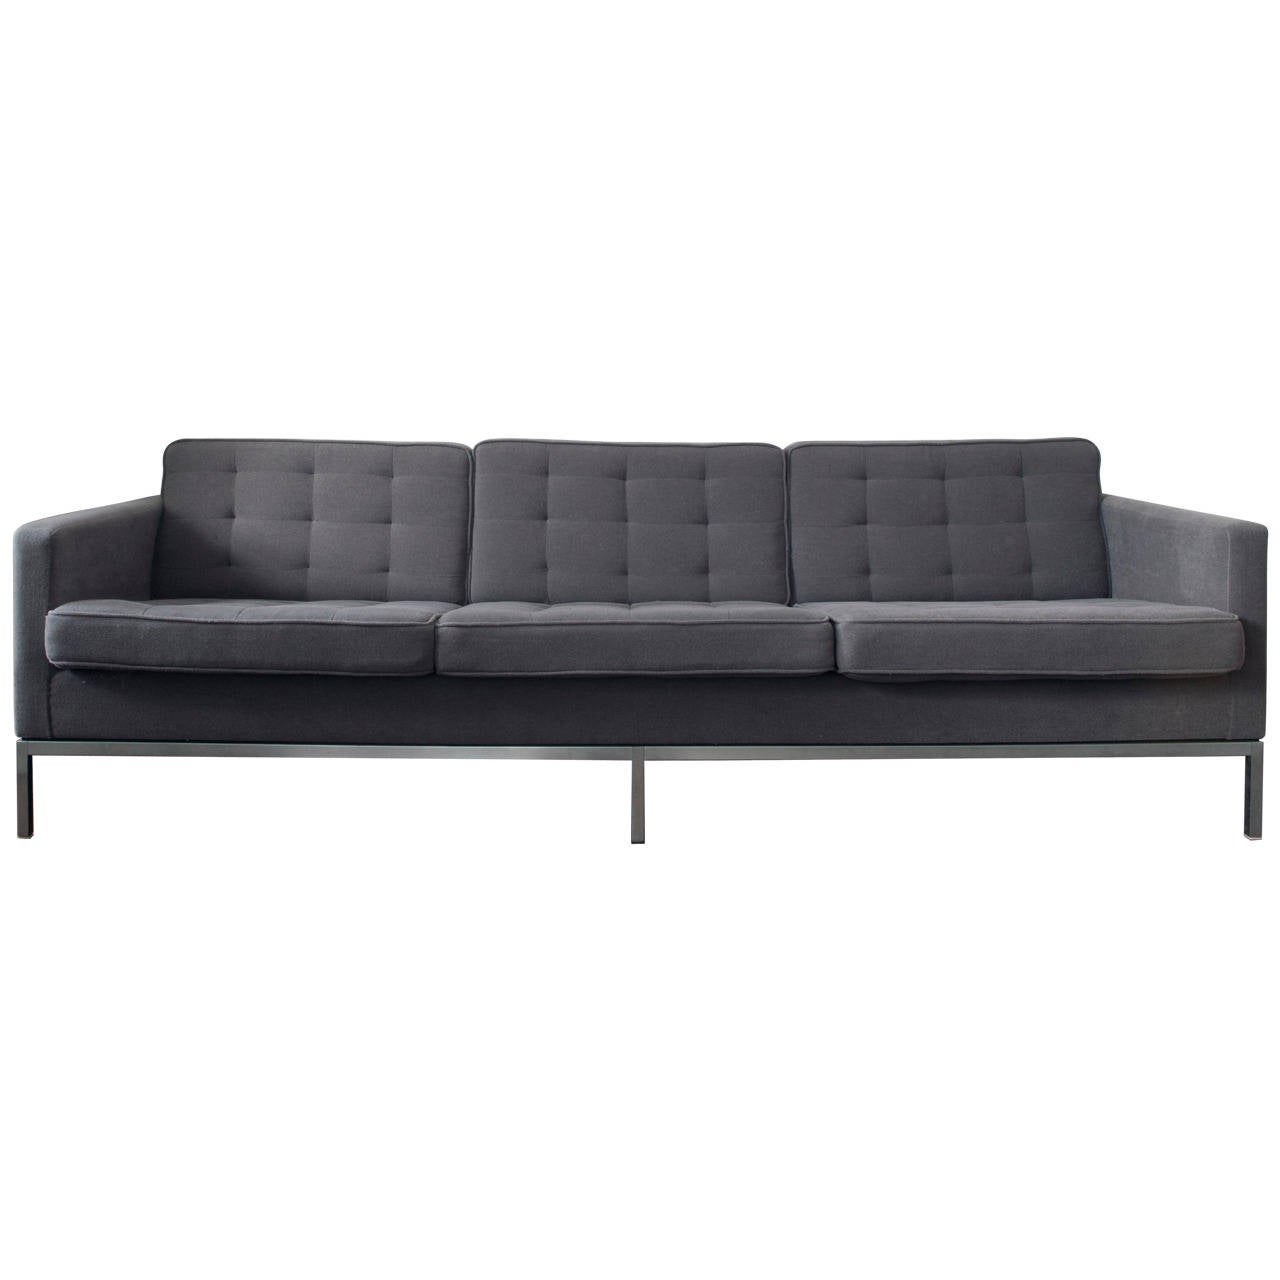 Florence knoll sofa by knoll associates for Knoll and associates